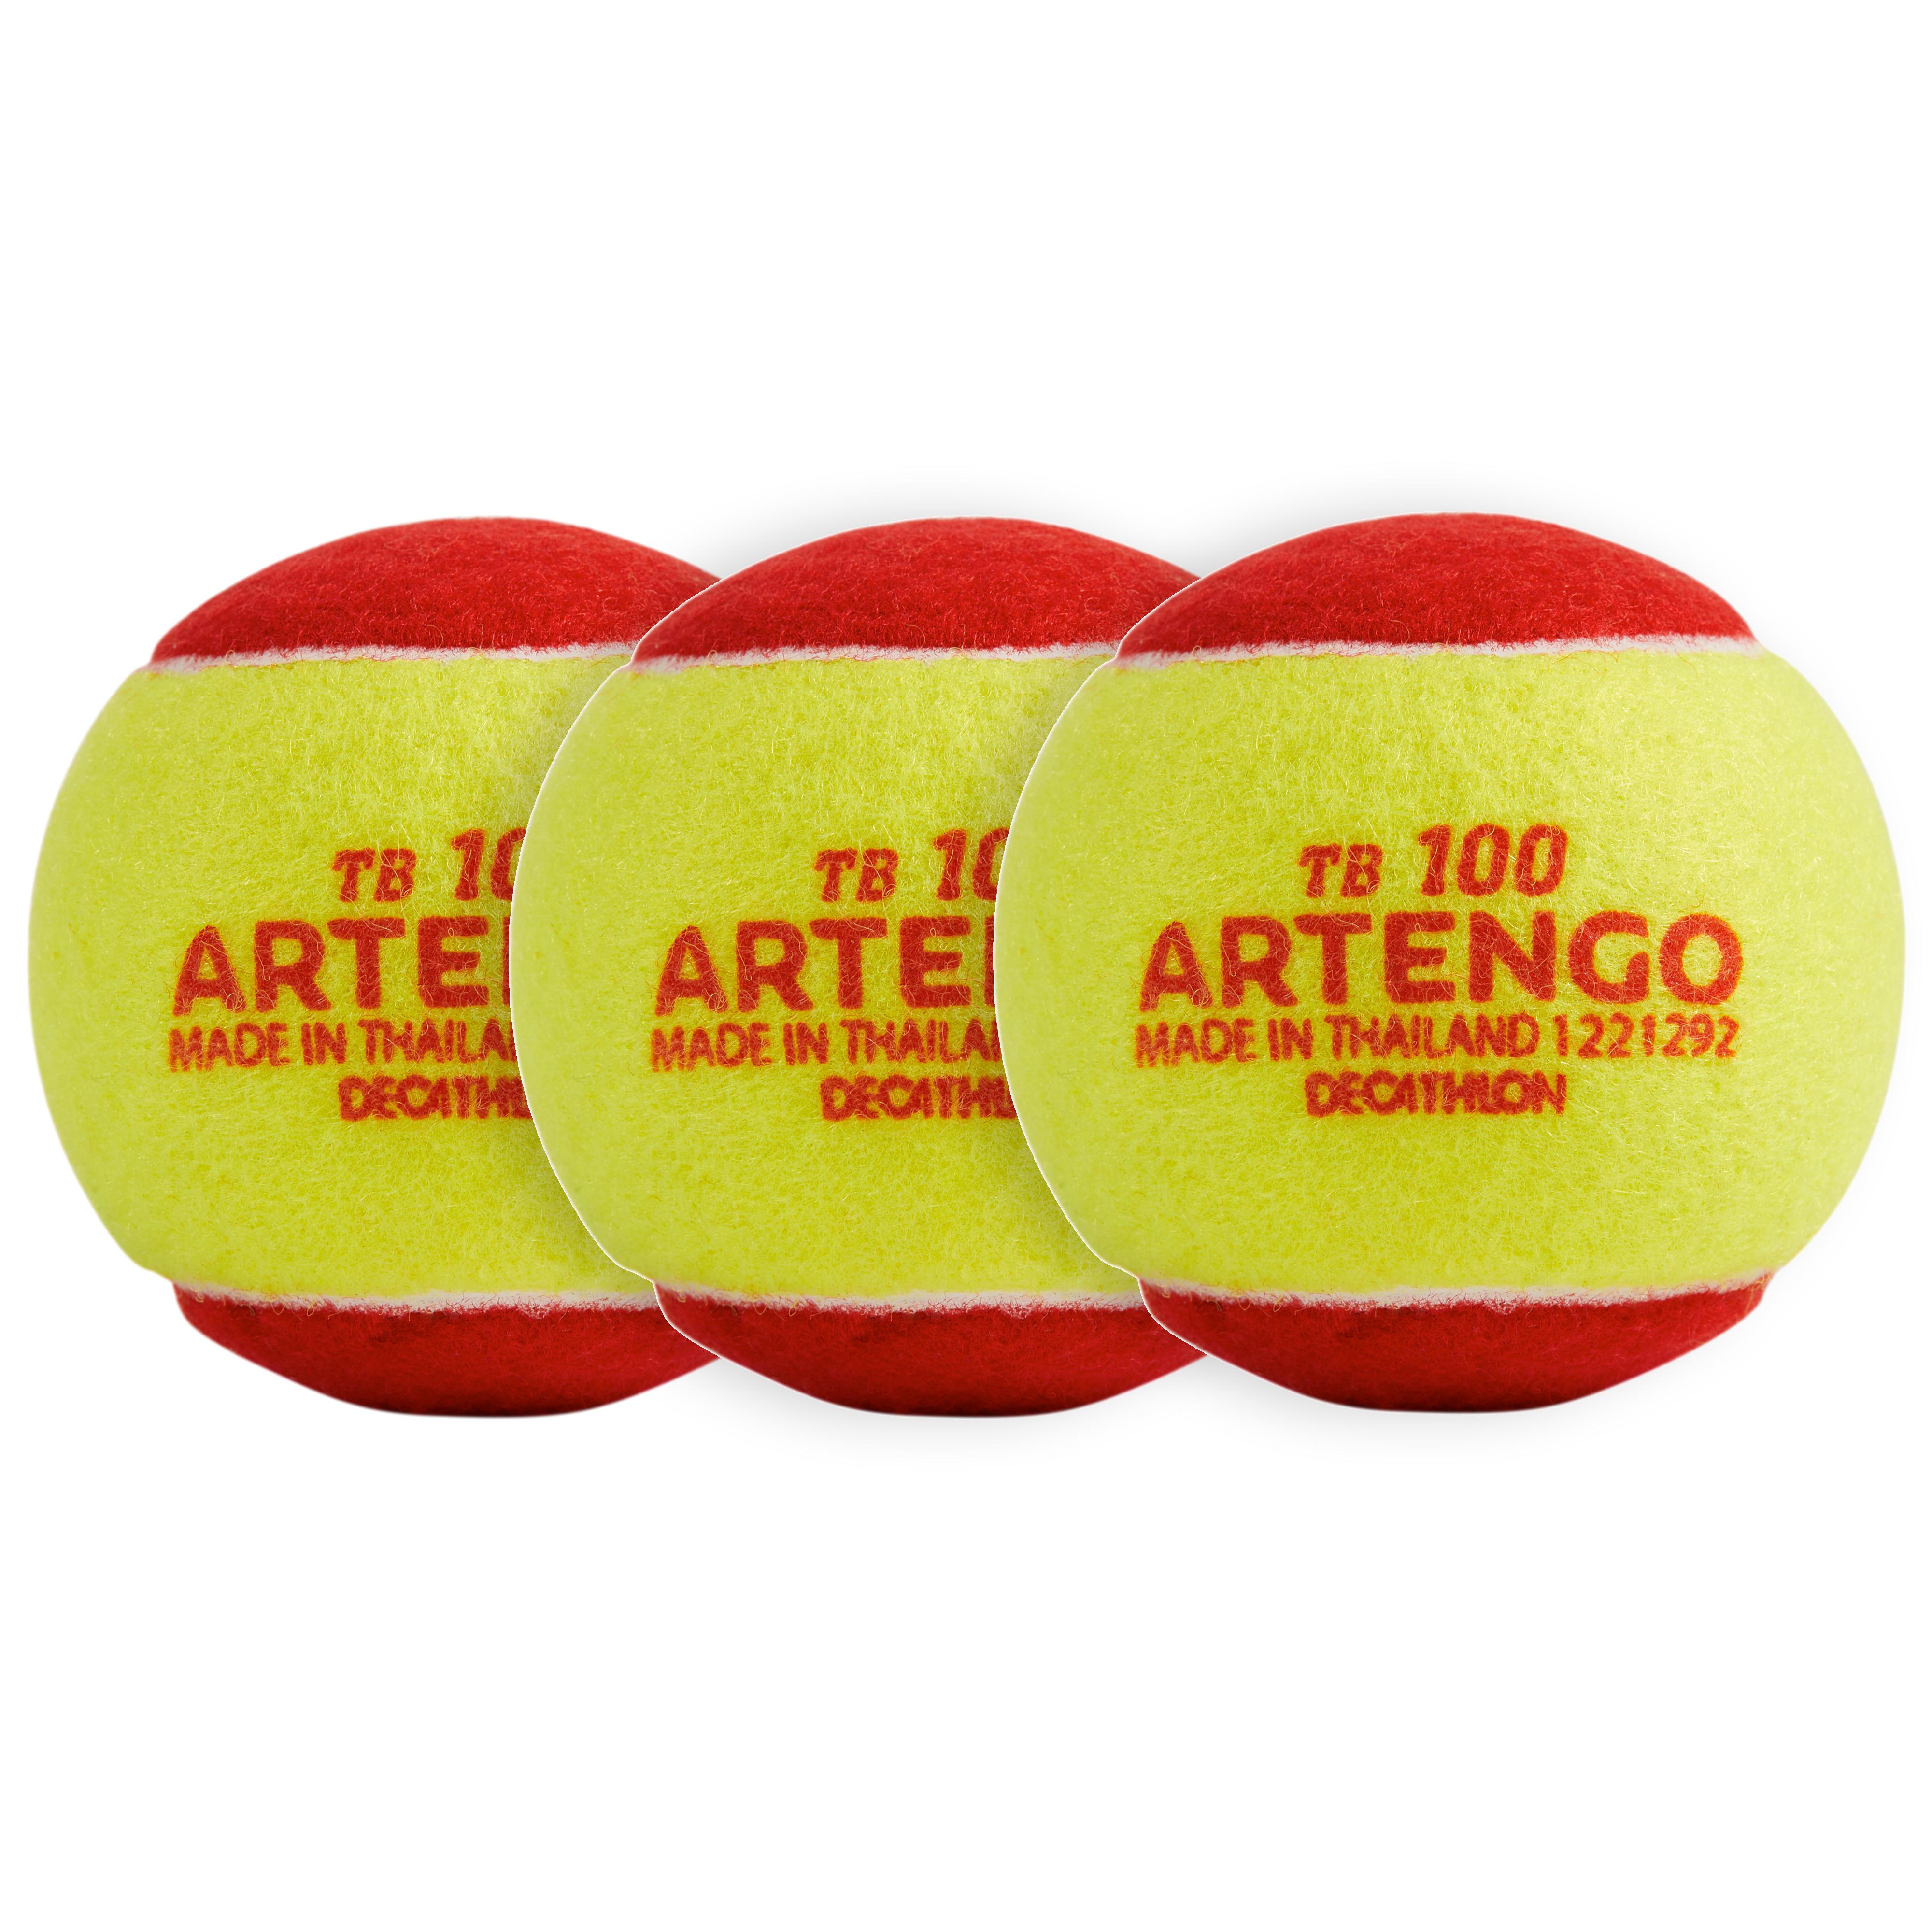 TB100 Tennis Balls...